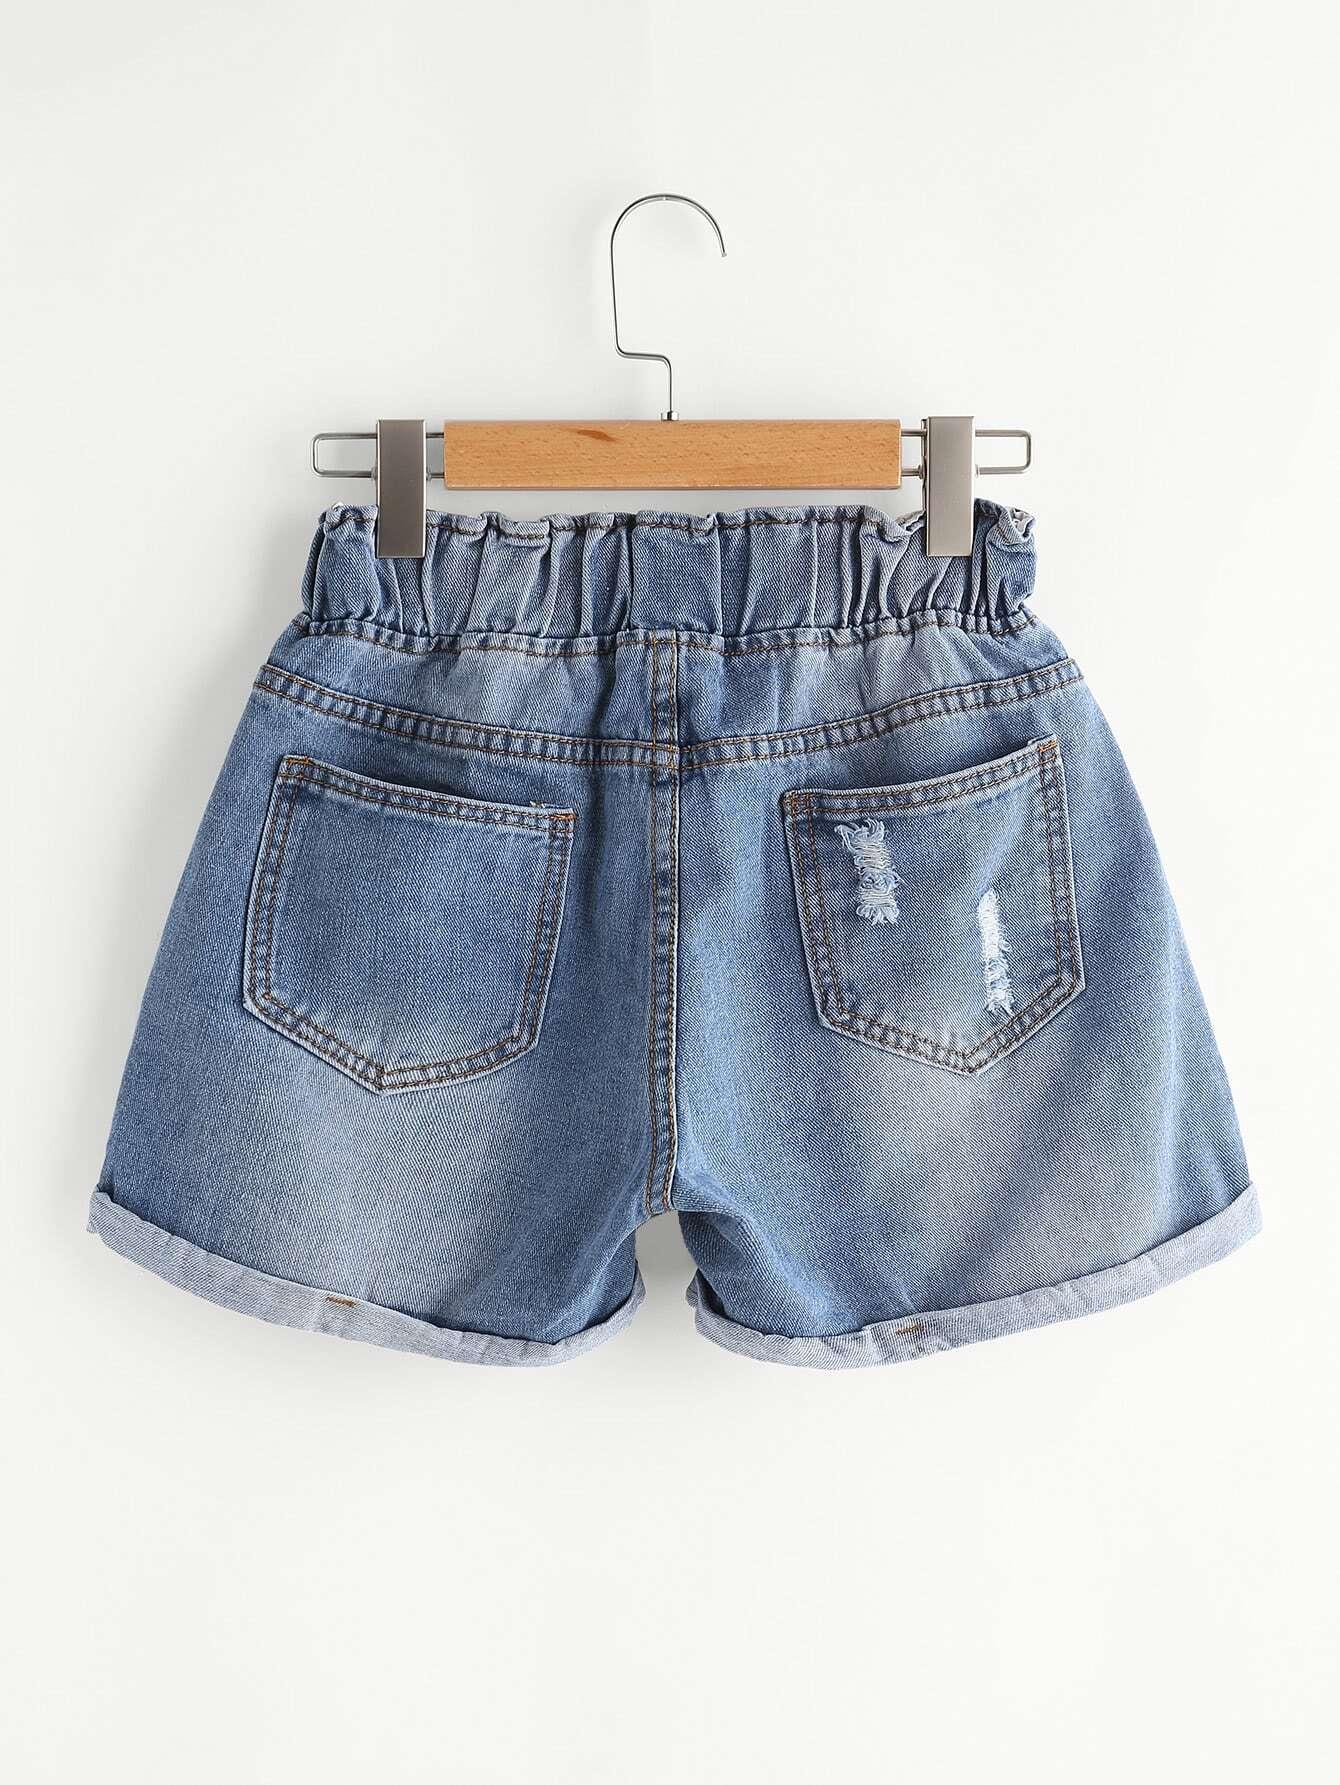 Distress Drawstring Waist Cuffed Denim Shorts